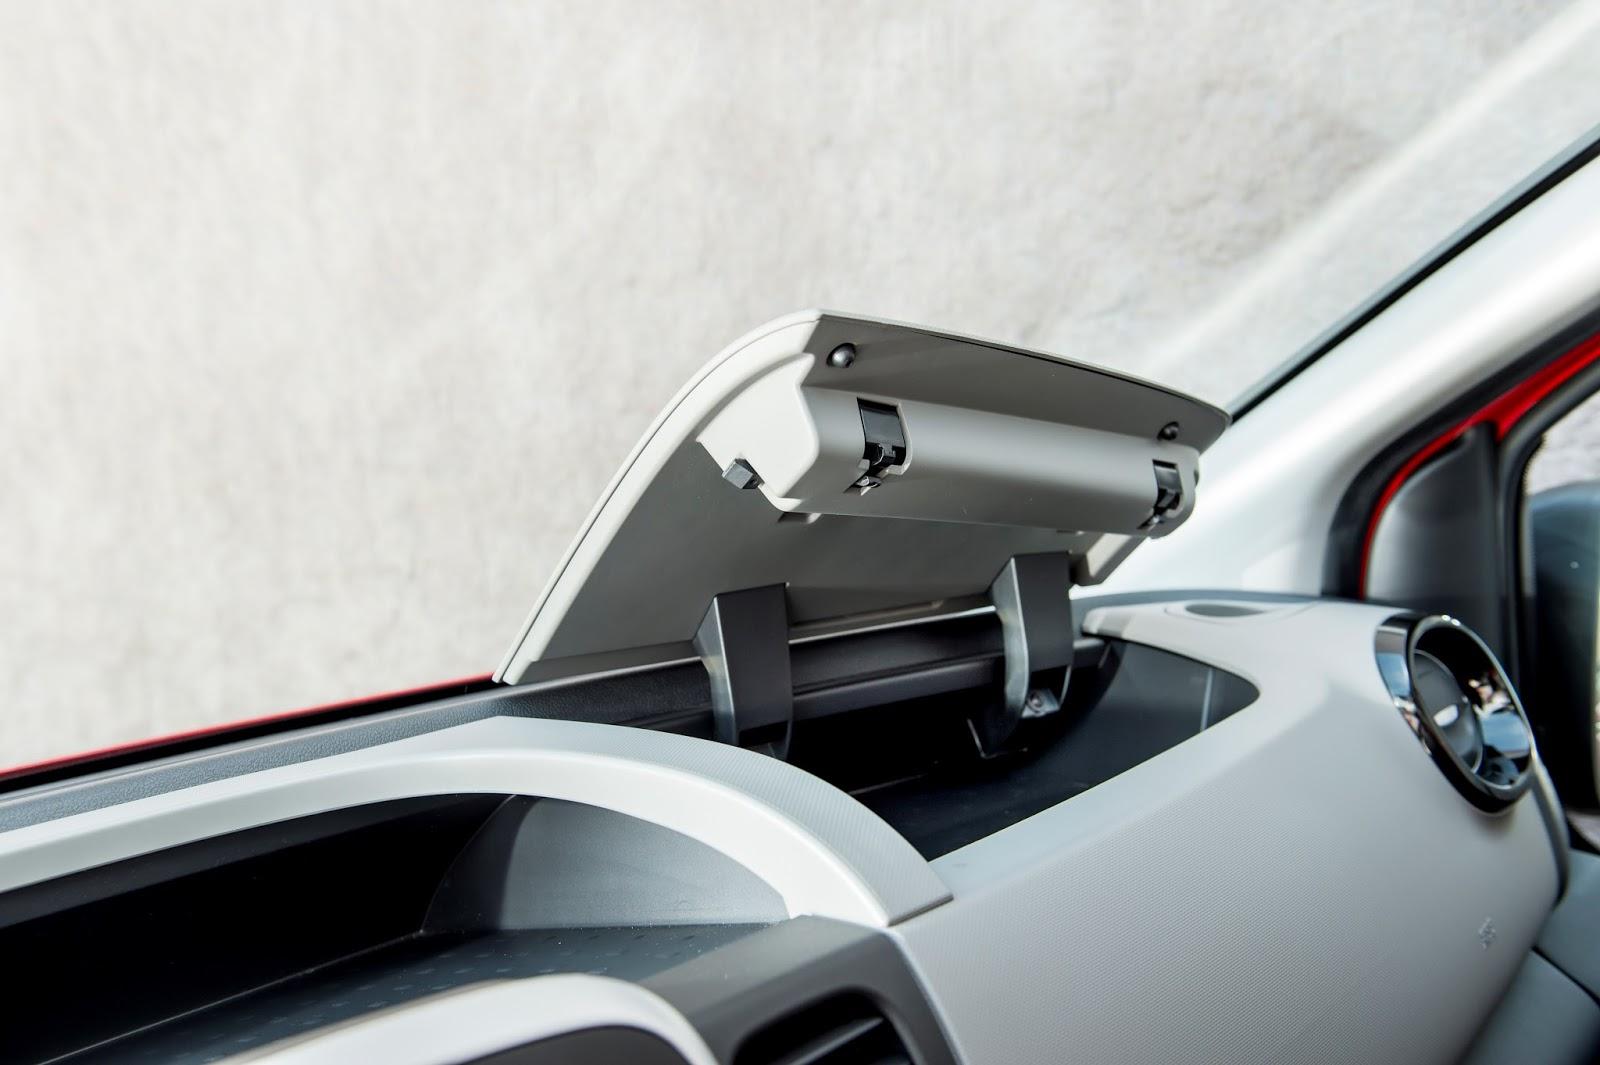 426150103 Nissan NV300 Van Παγκόσμιο ντεμπούτο για το νέο Nissan NV300 Nissan, Nissan NV, Nissan NV300, Nissan NV400, VAN, videos, Επαγγελματικά